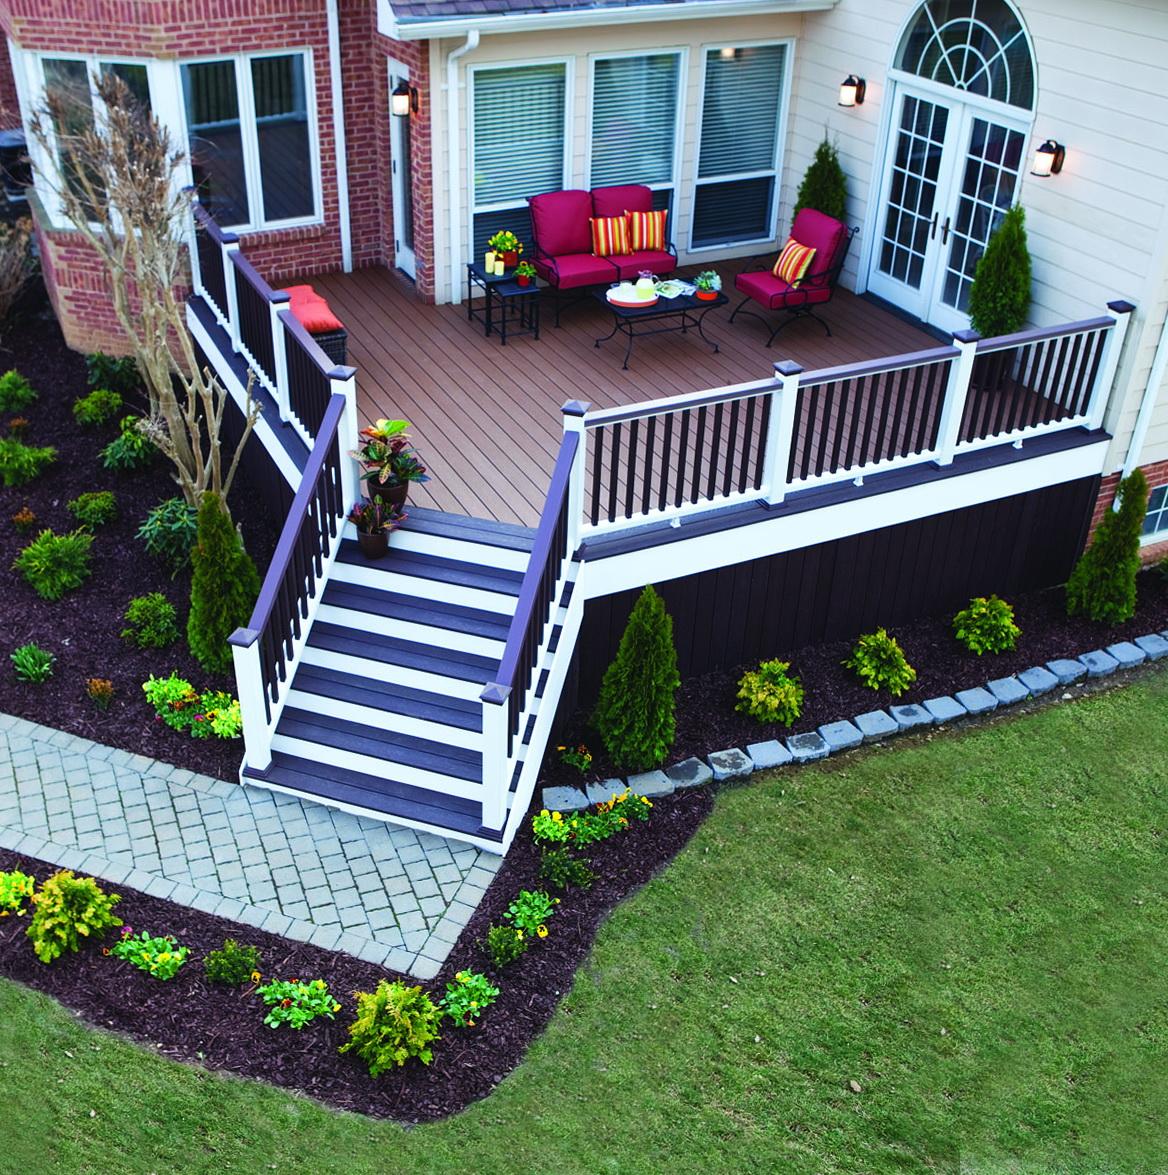 Trex decking colors pdf home design ideas for Colors of composite decking